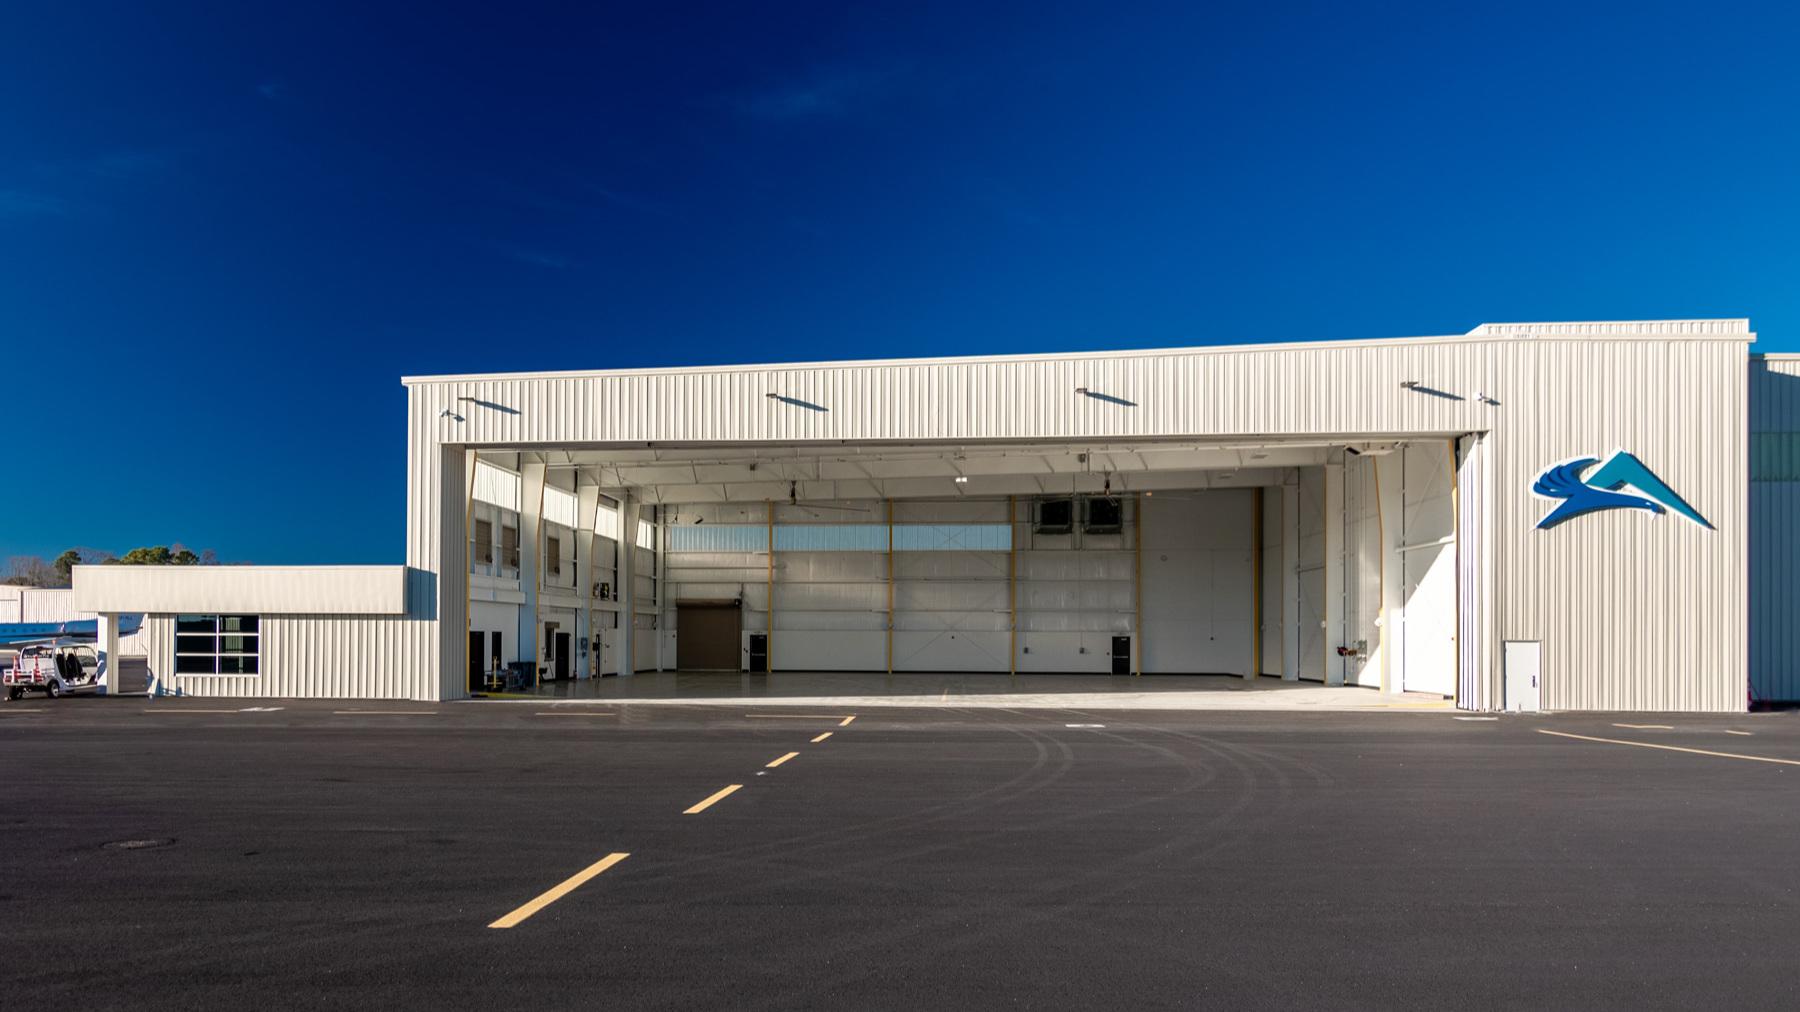 PDK_Hangar-1-Exterior-4.jpg